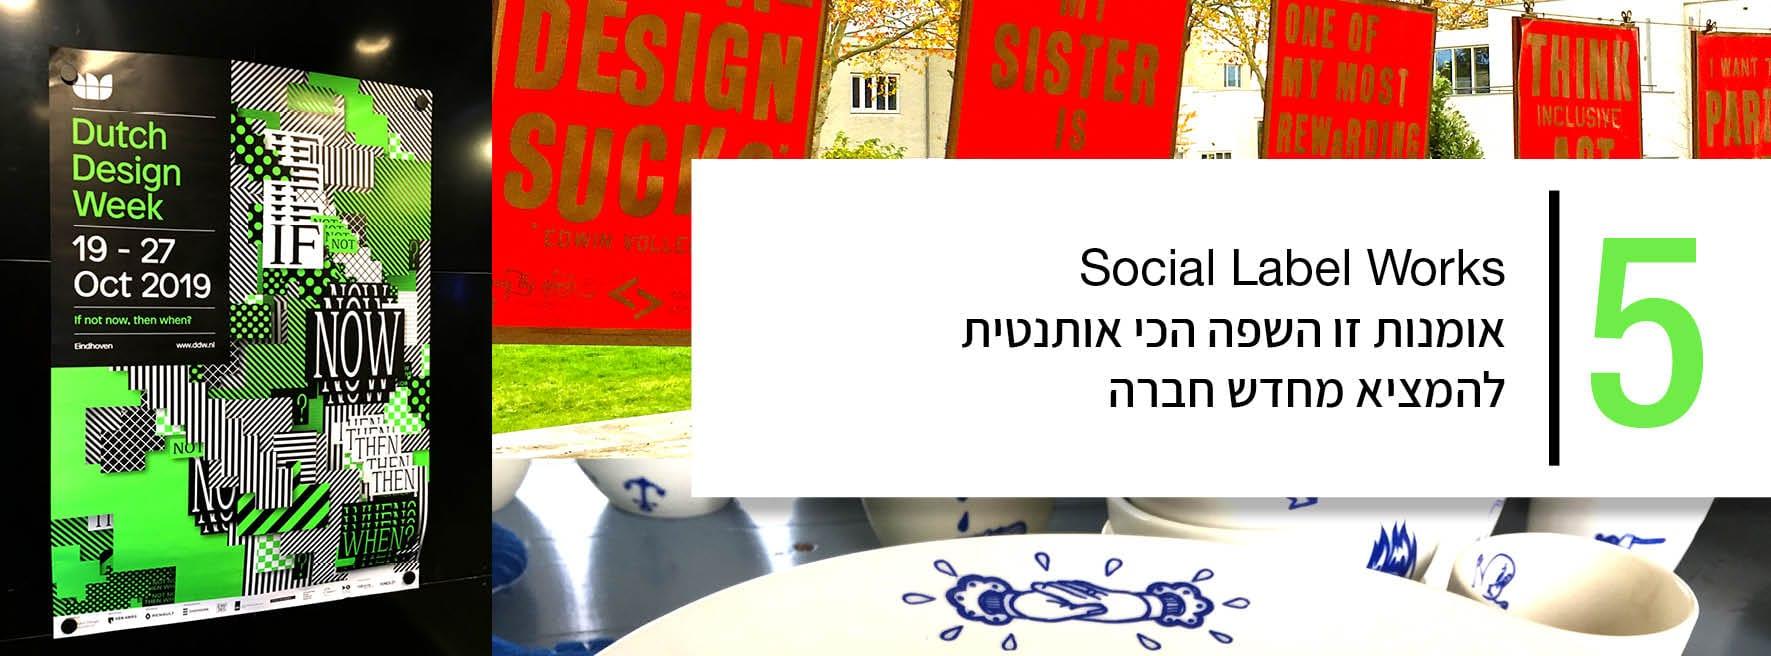 Social Label Works. אומנות זו השפה הכי אותנטית להמציא מחדש חברה